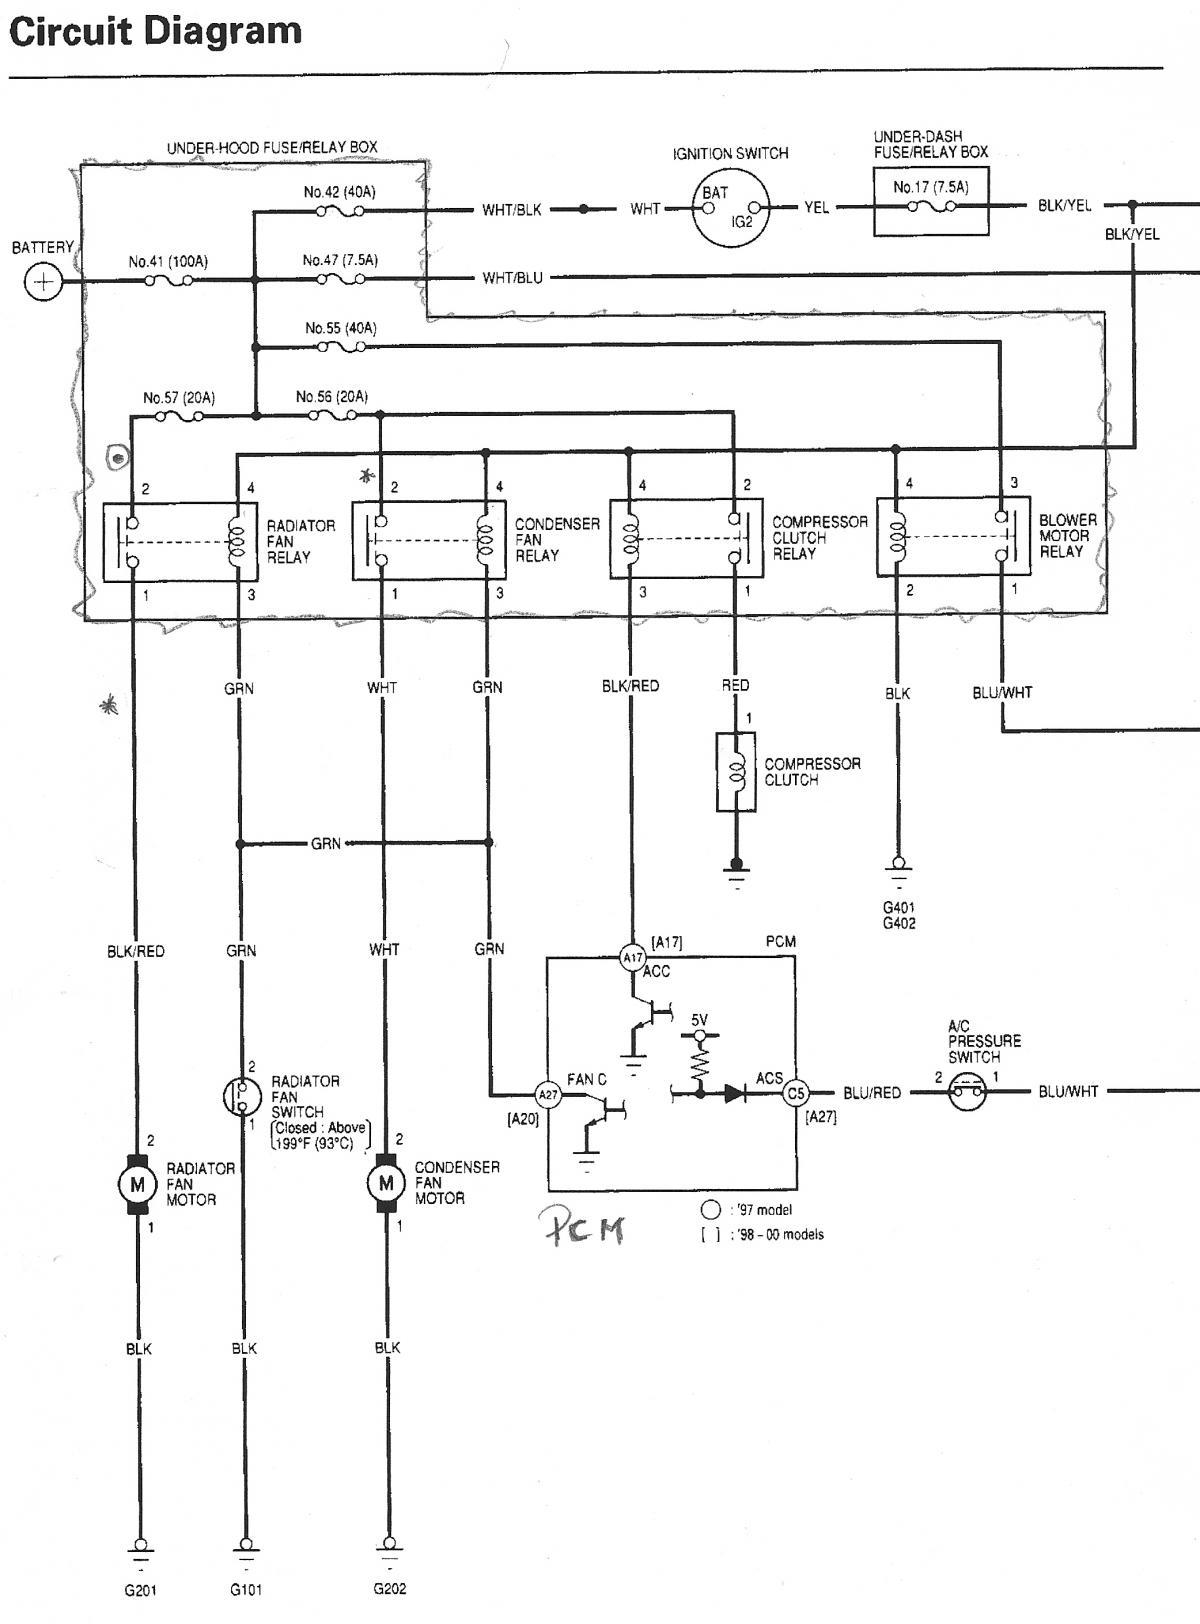 Wiring Diagram For 2001 Honda Cr V - wiring diagrams schematics